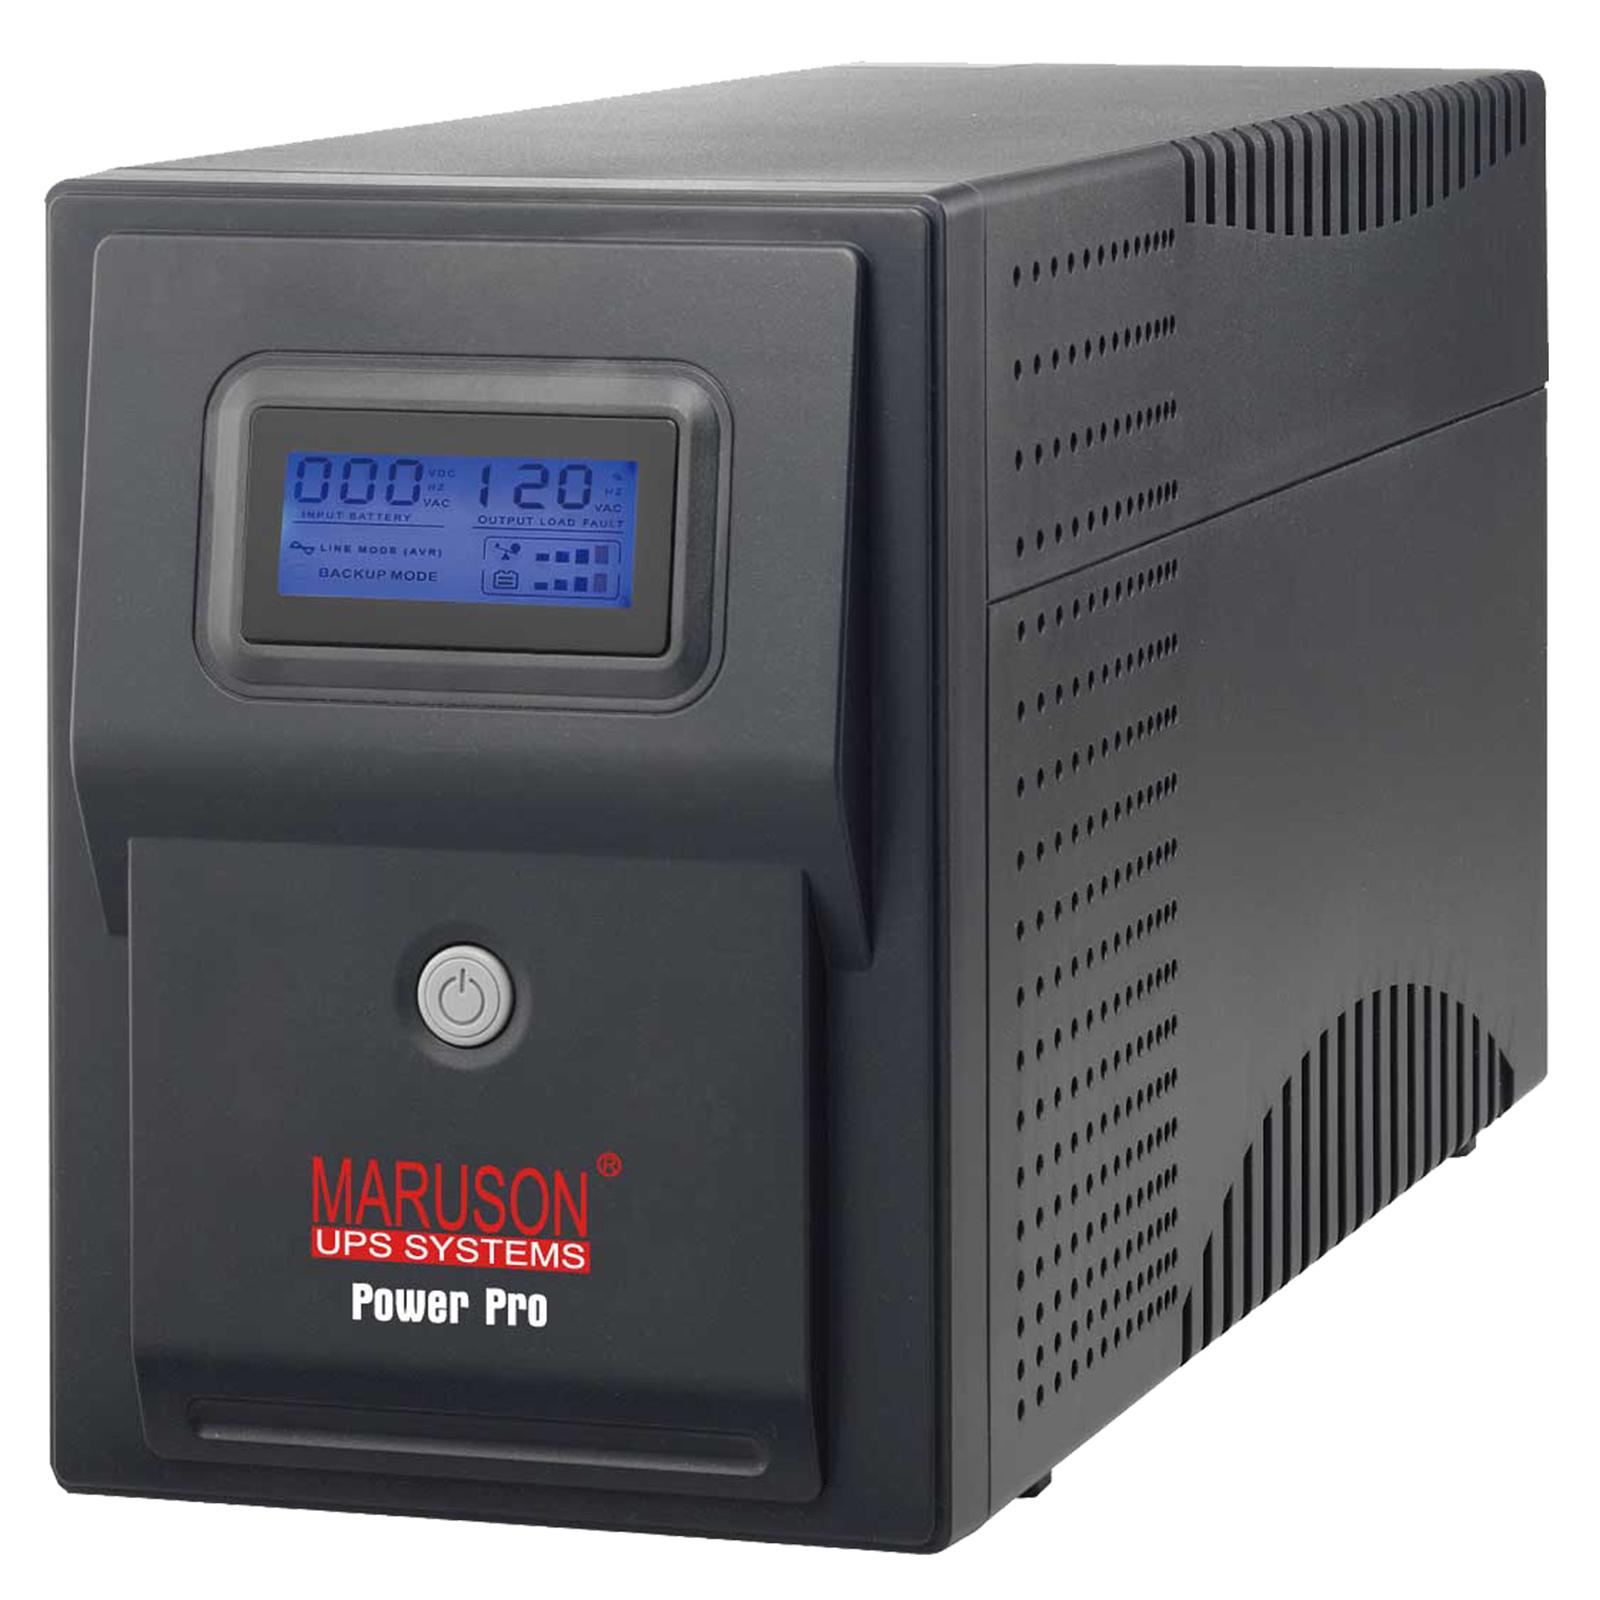 MARUSON POWERPRO ALCD SERIES 1000 VA - UPS SYSTEMS - PRO-1000ALCD